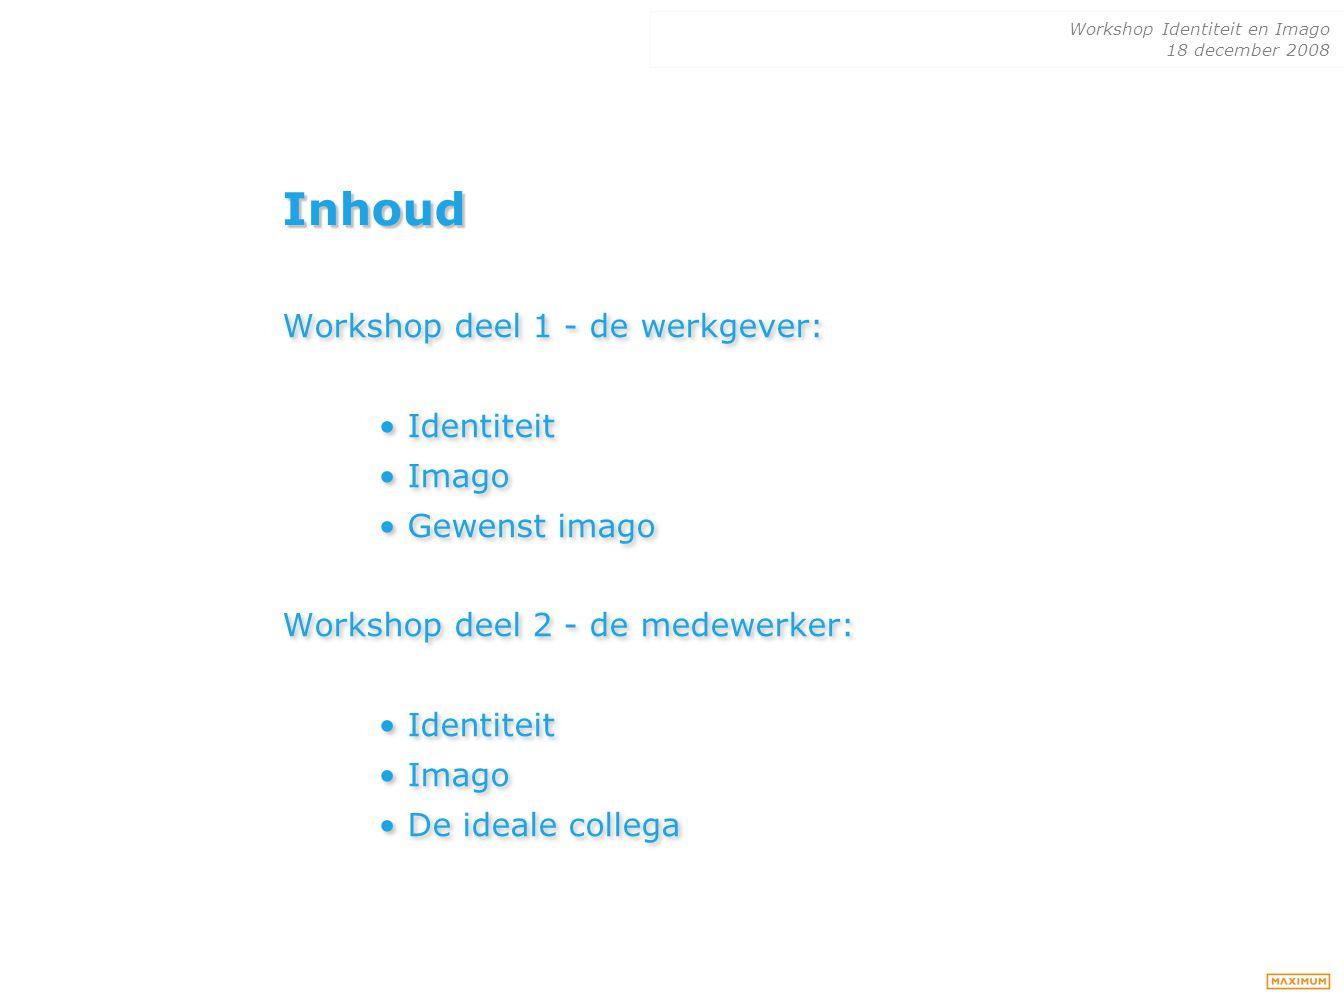 Workshop Identiteit en Imago 18 december 2008 Inhoud Workshop deel 1 - de werkgever: Identiteit Imago Gewenst imago Workshop deel 2 - de medewerker: I